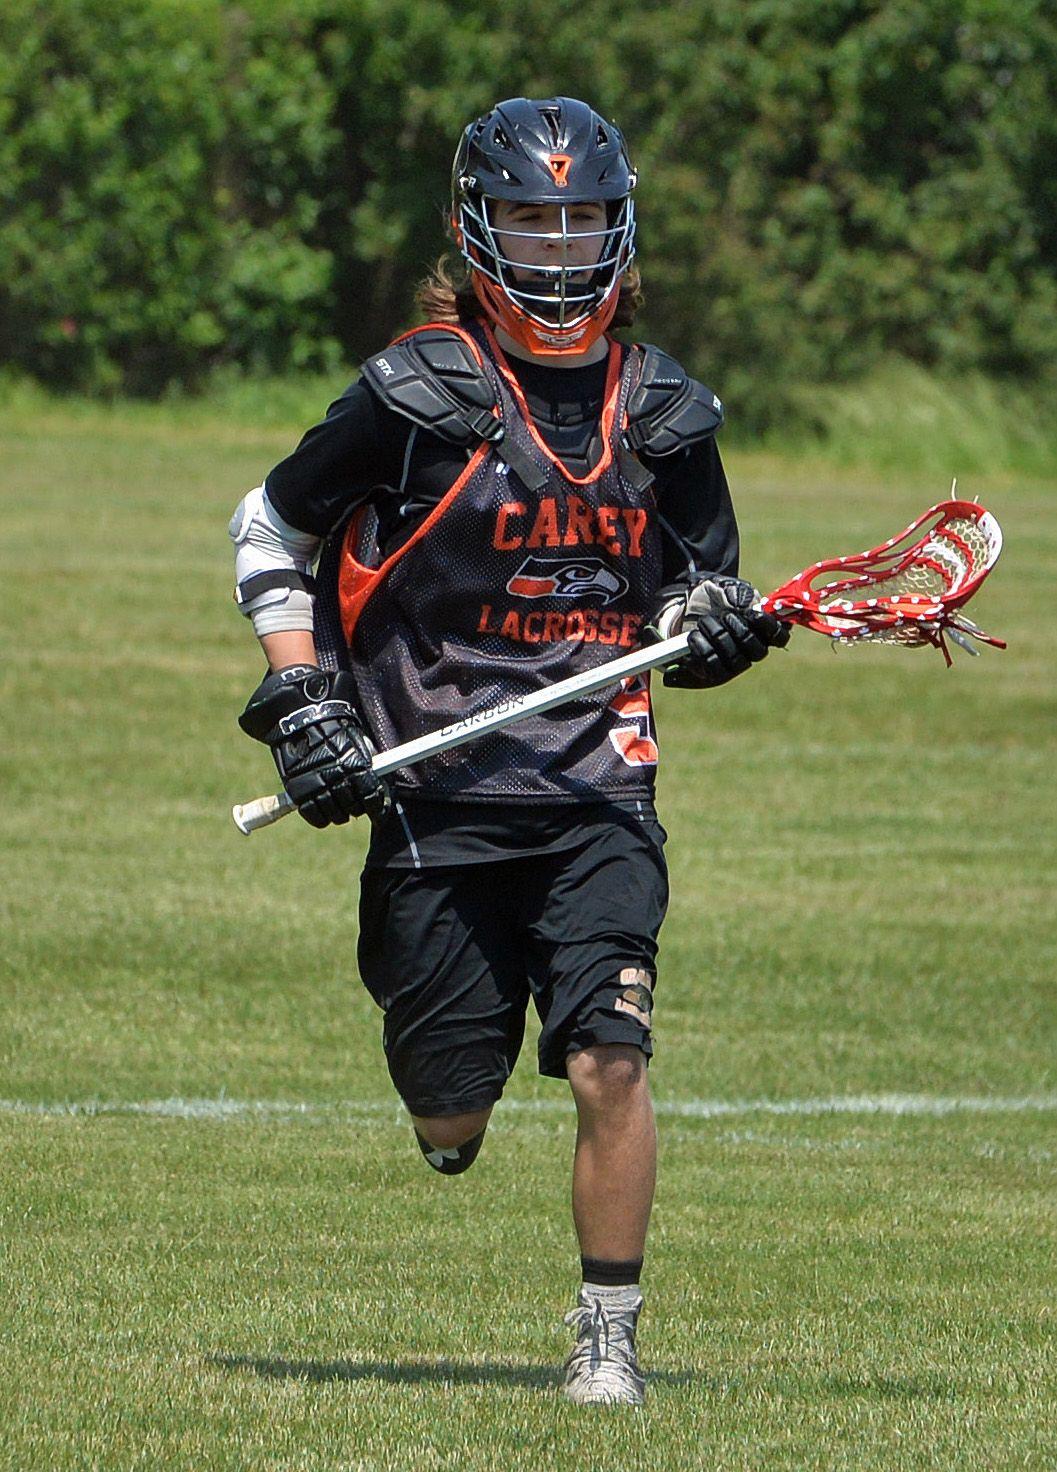 Carey seahawks lacrosse carey seahawks hf carey high